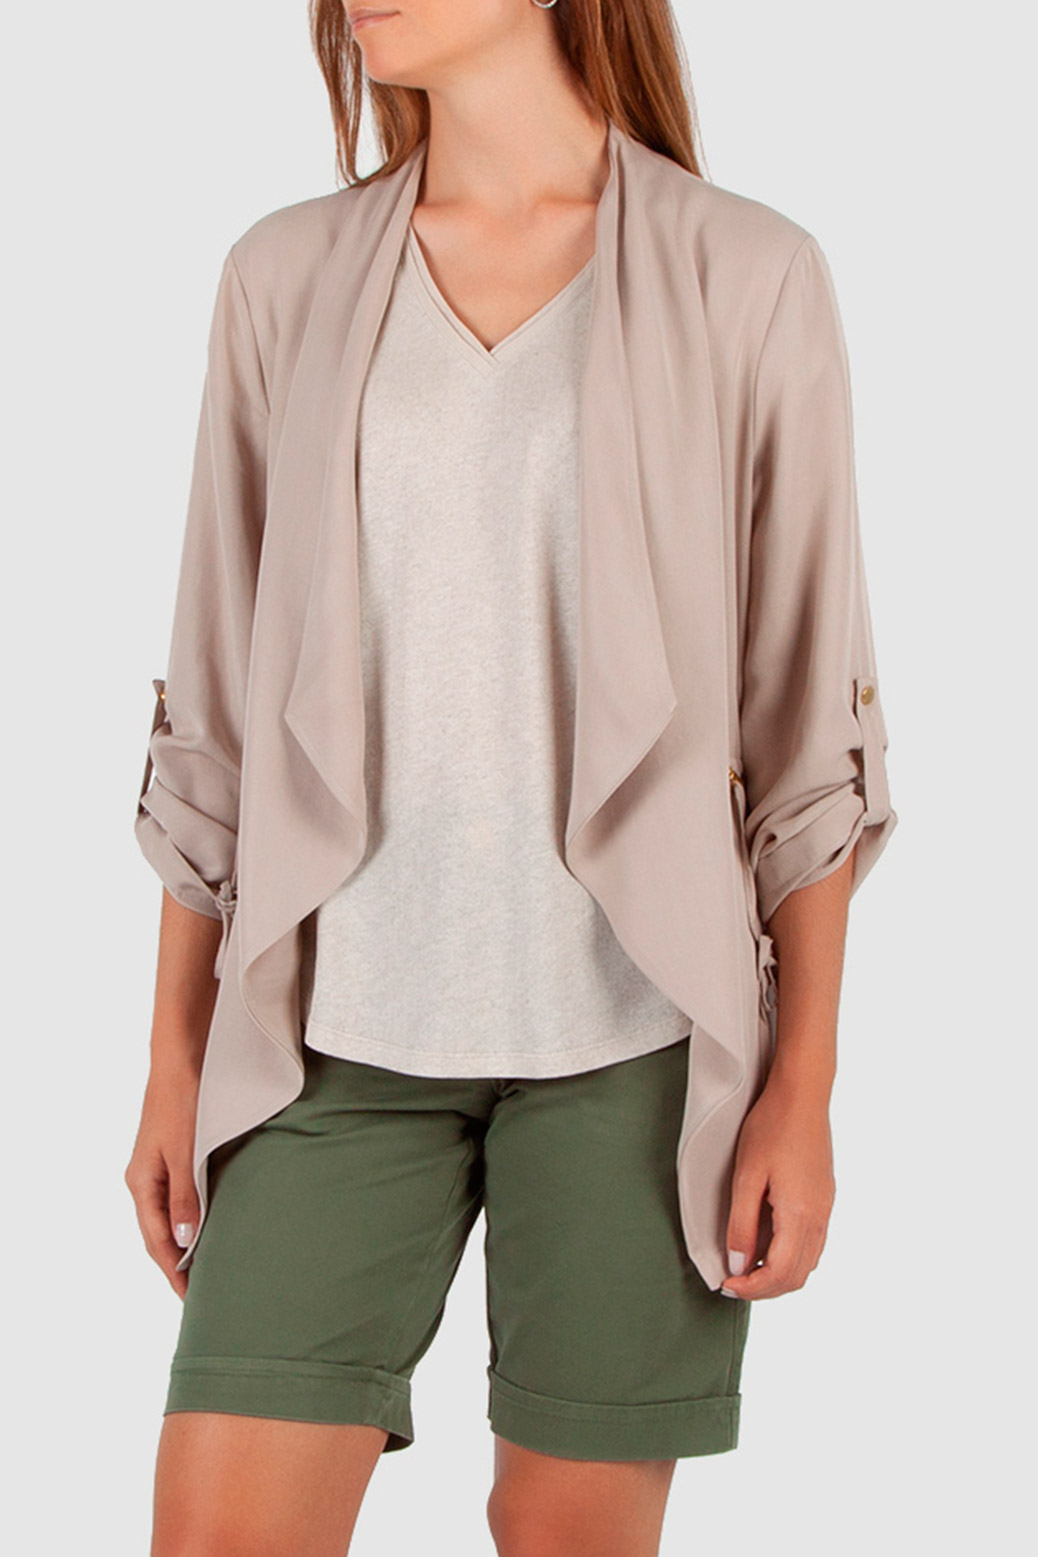 Loose-fitting jacket